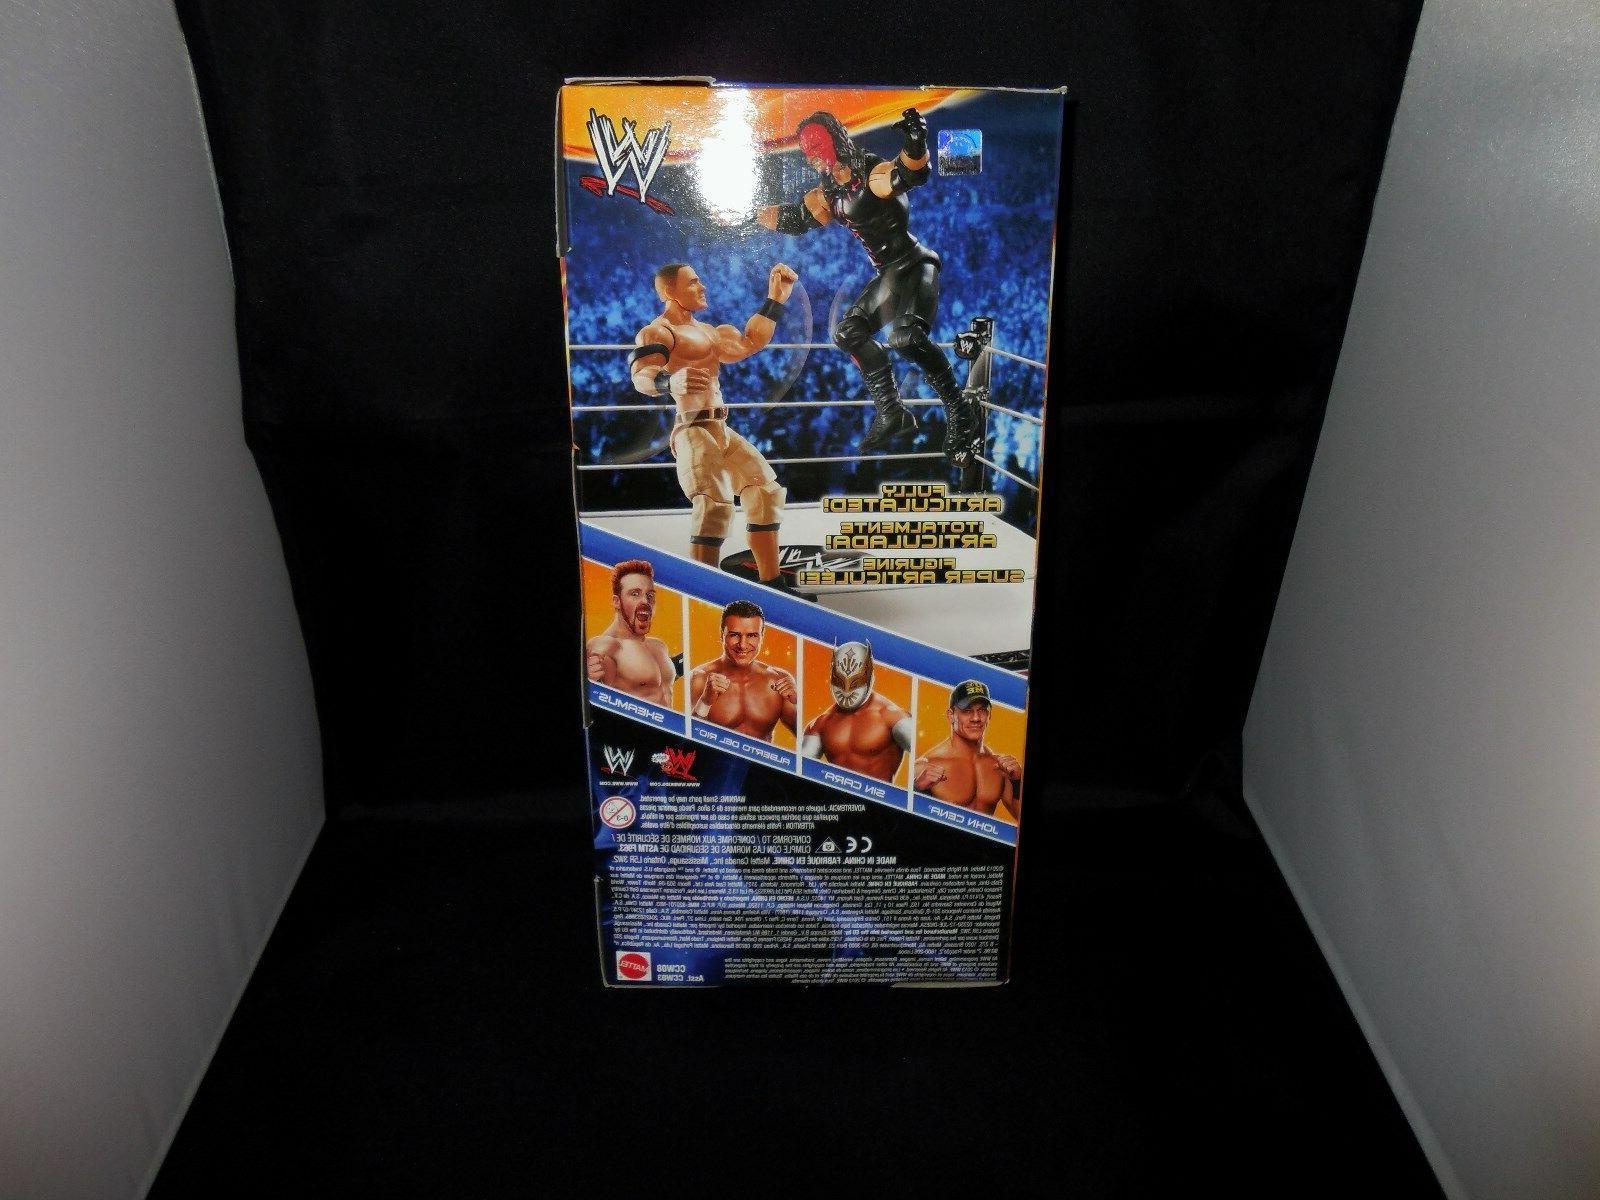 WWE Action John Cena, Alberto Del Rio & Sheamus